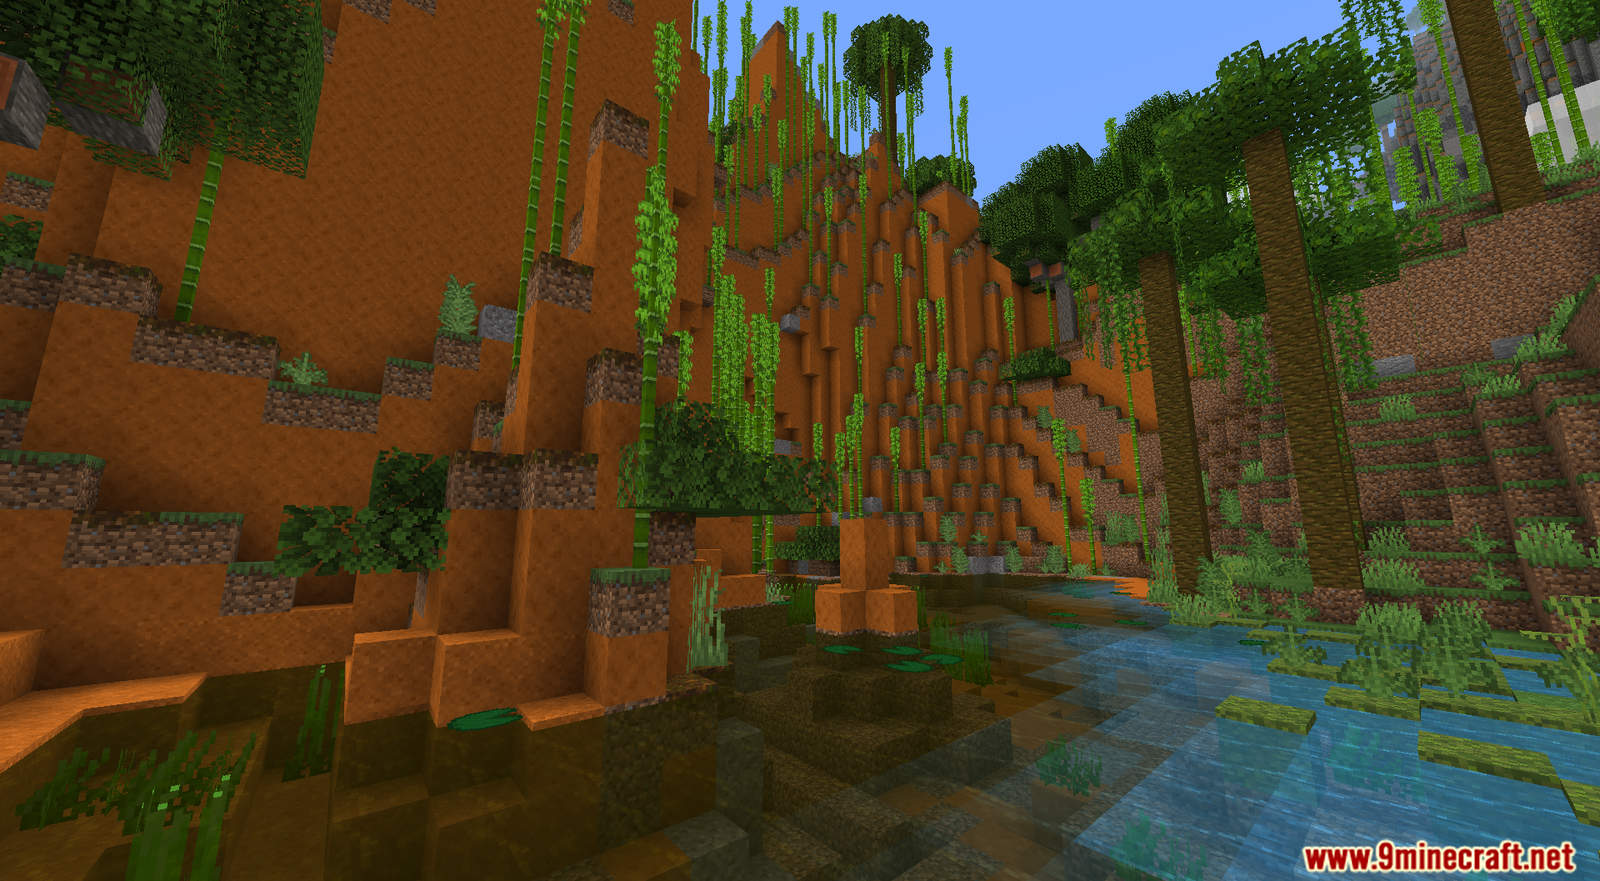 William Wythers' Overhauled Overworld Mod for Minecraft (19)